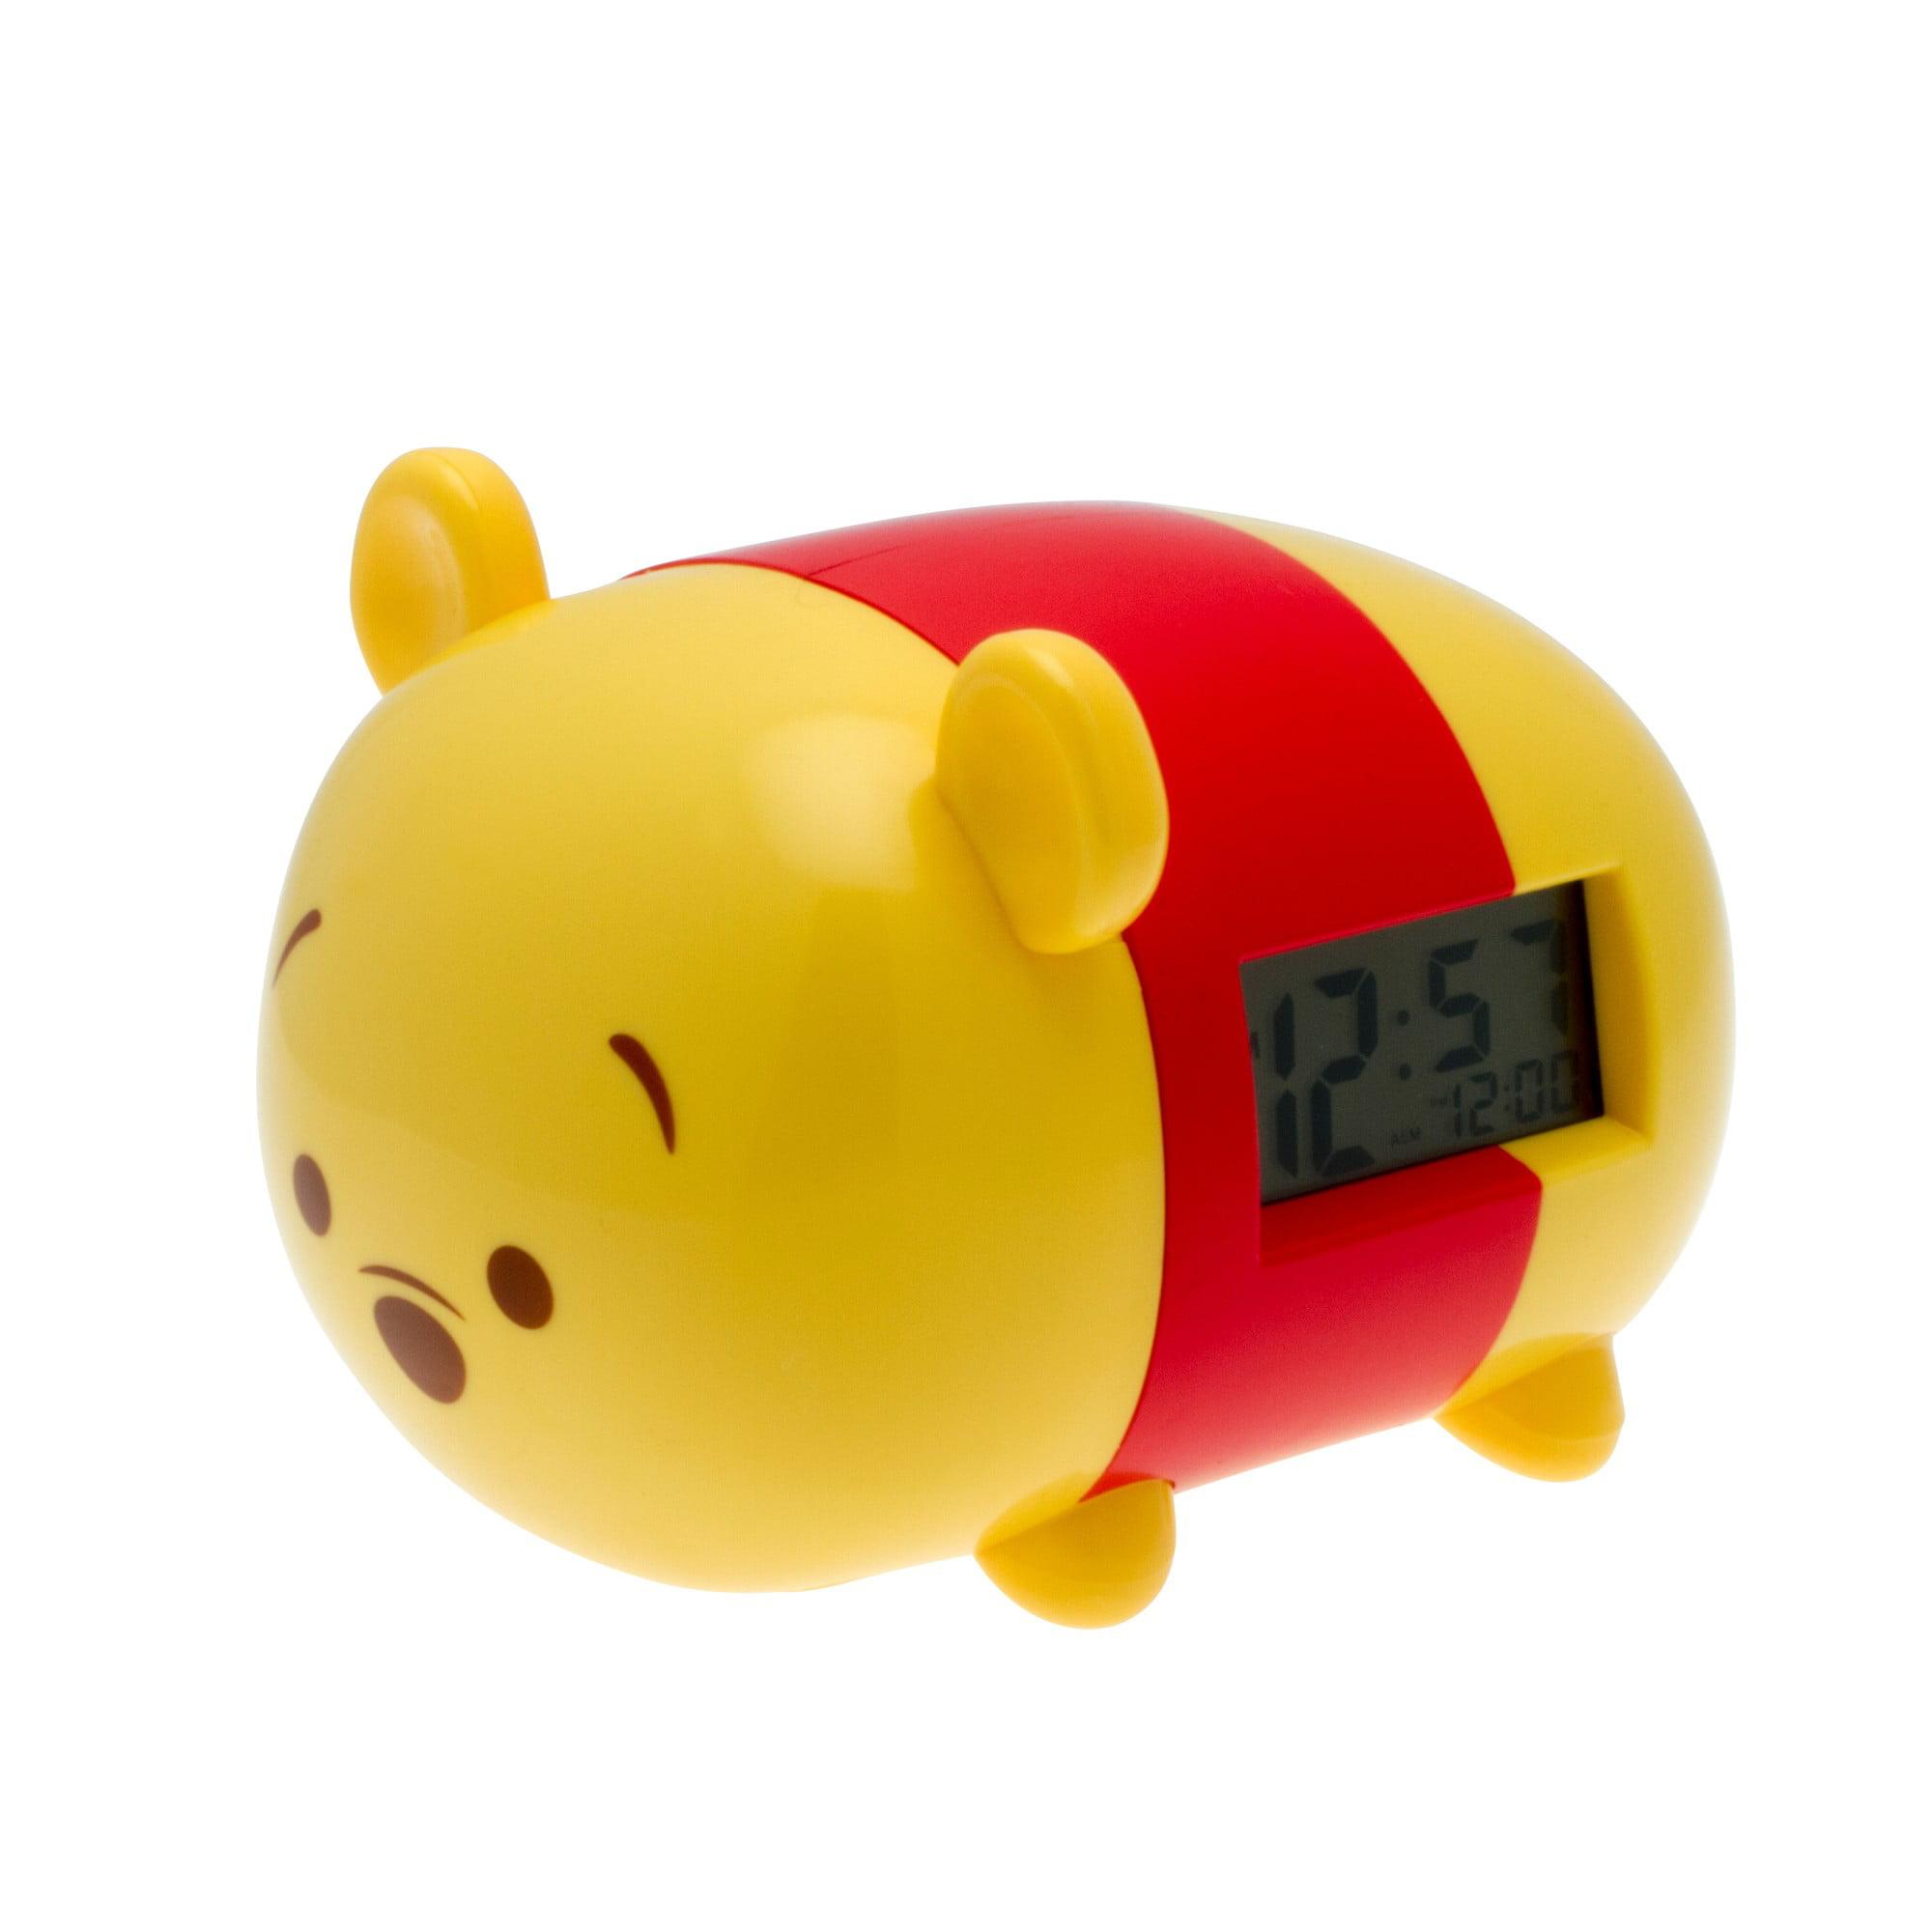 BulbBotz Disney Tsum Tsum Winnie the Pooh Clock by ClicTime